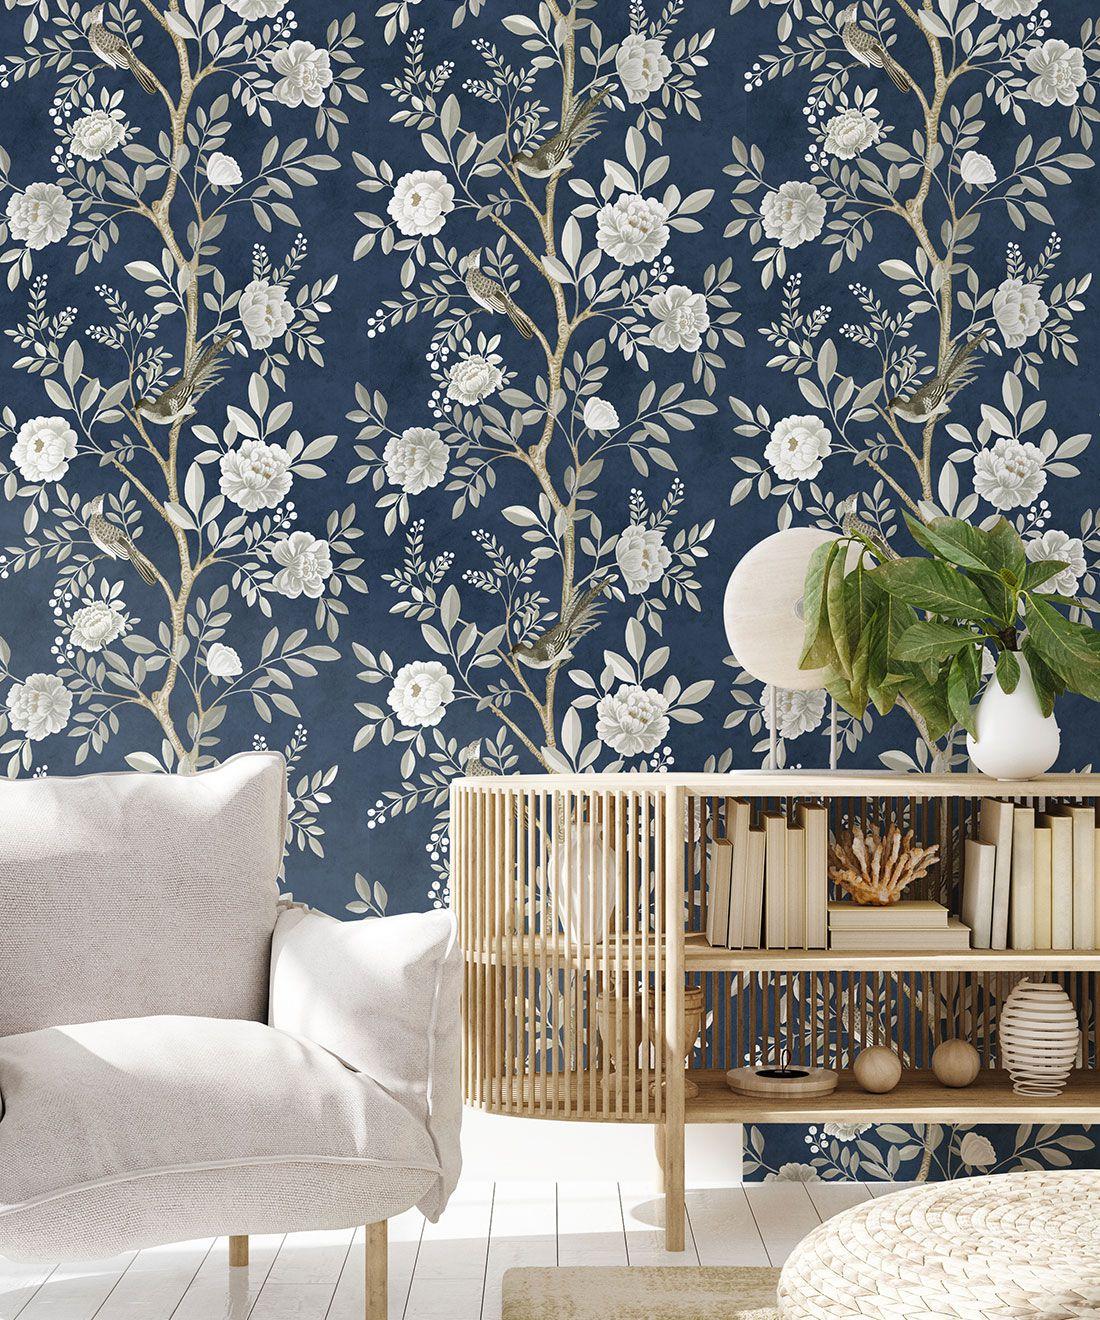 Chinoiserie Wallpaper •Floral Wallpaper •Bird Wallpaper • Magnolia • Royal Blue • Insitu